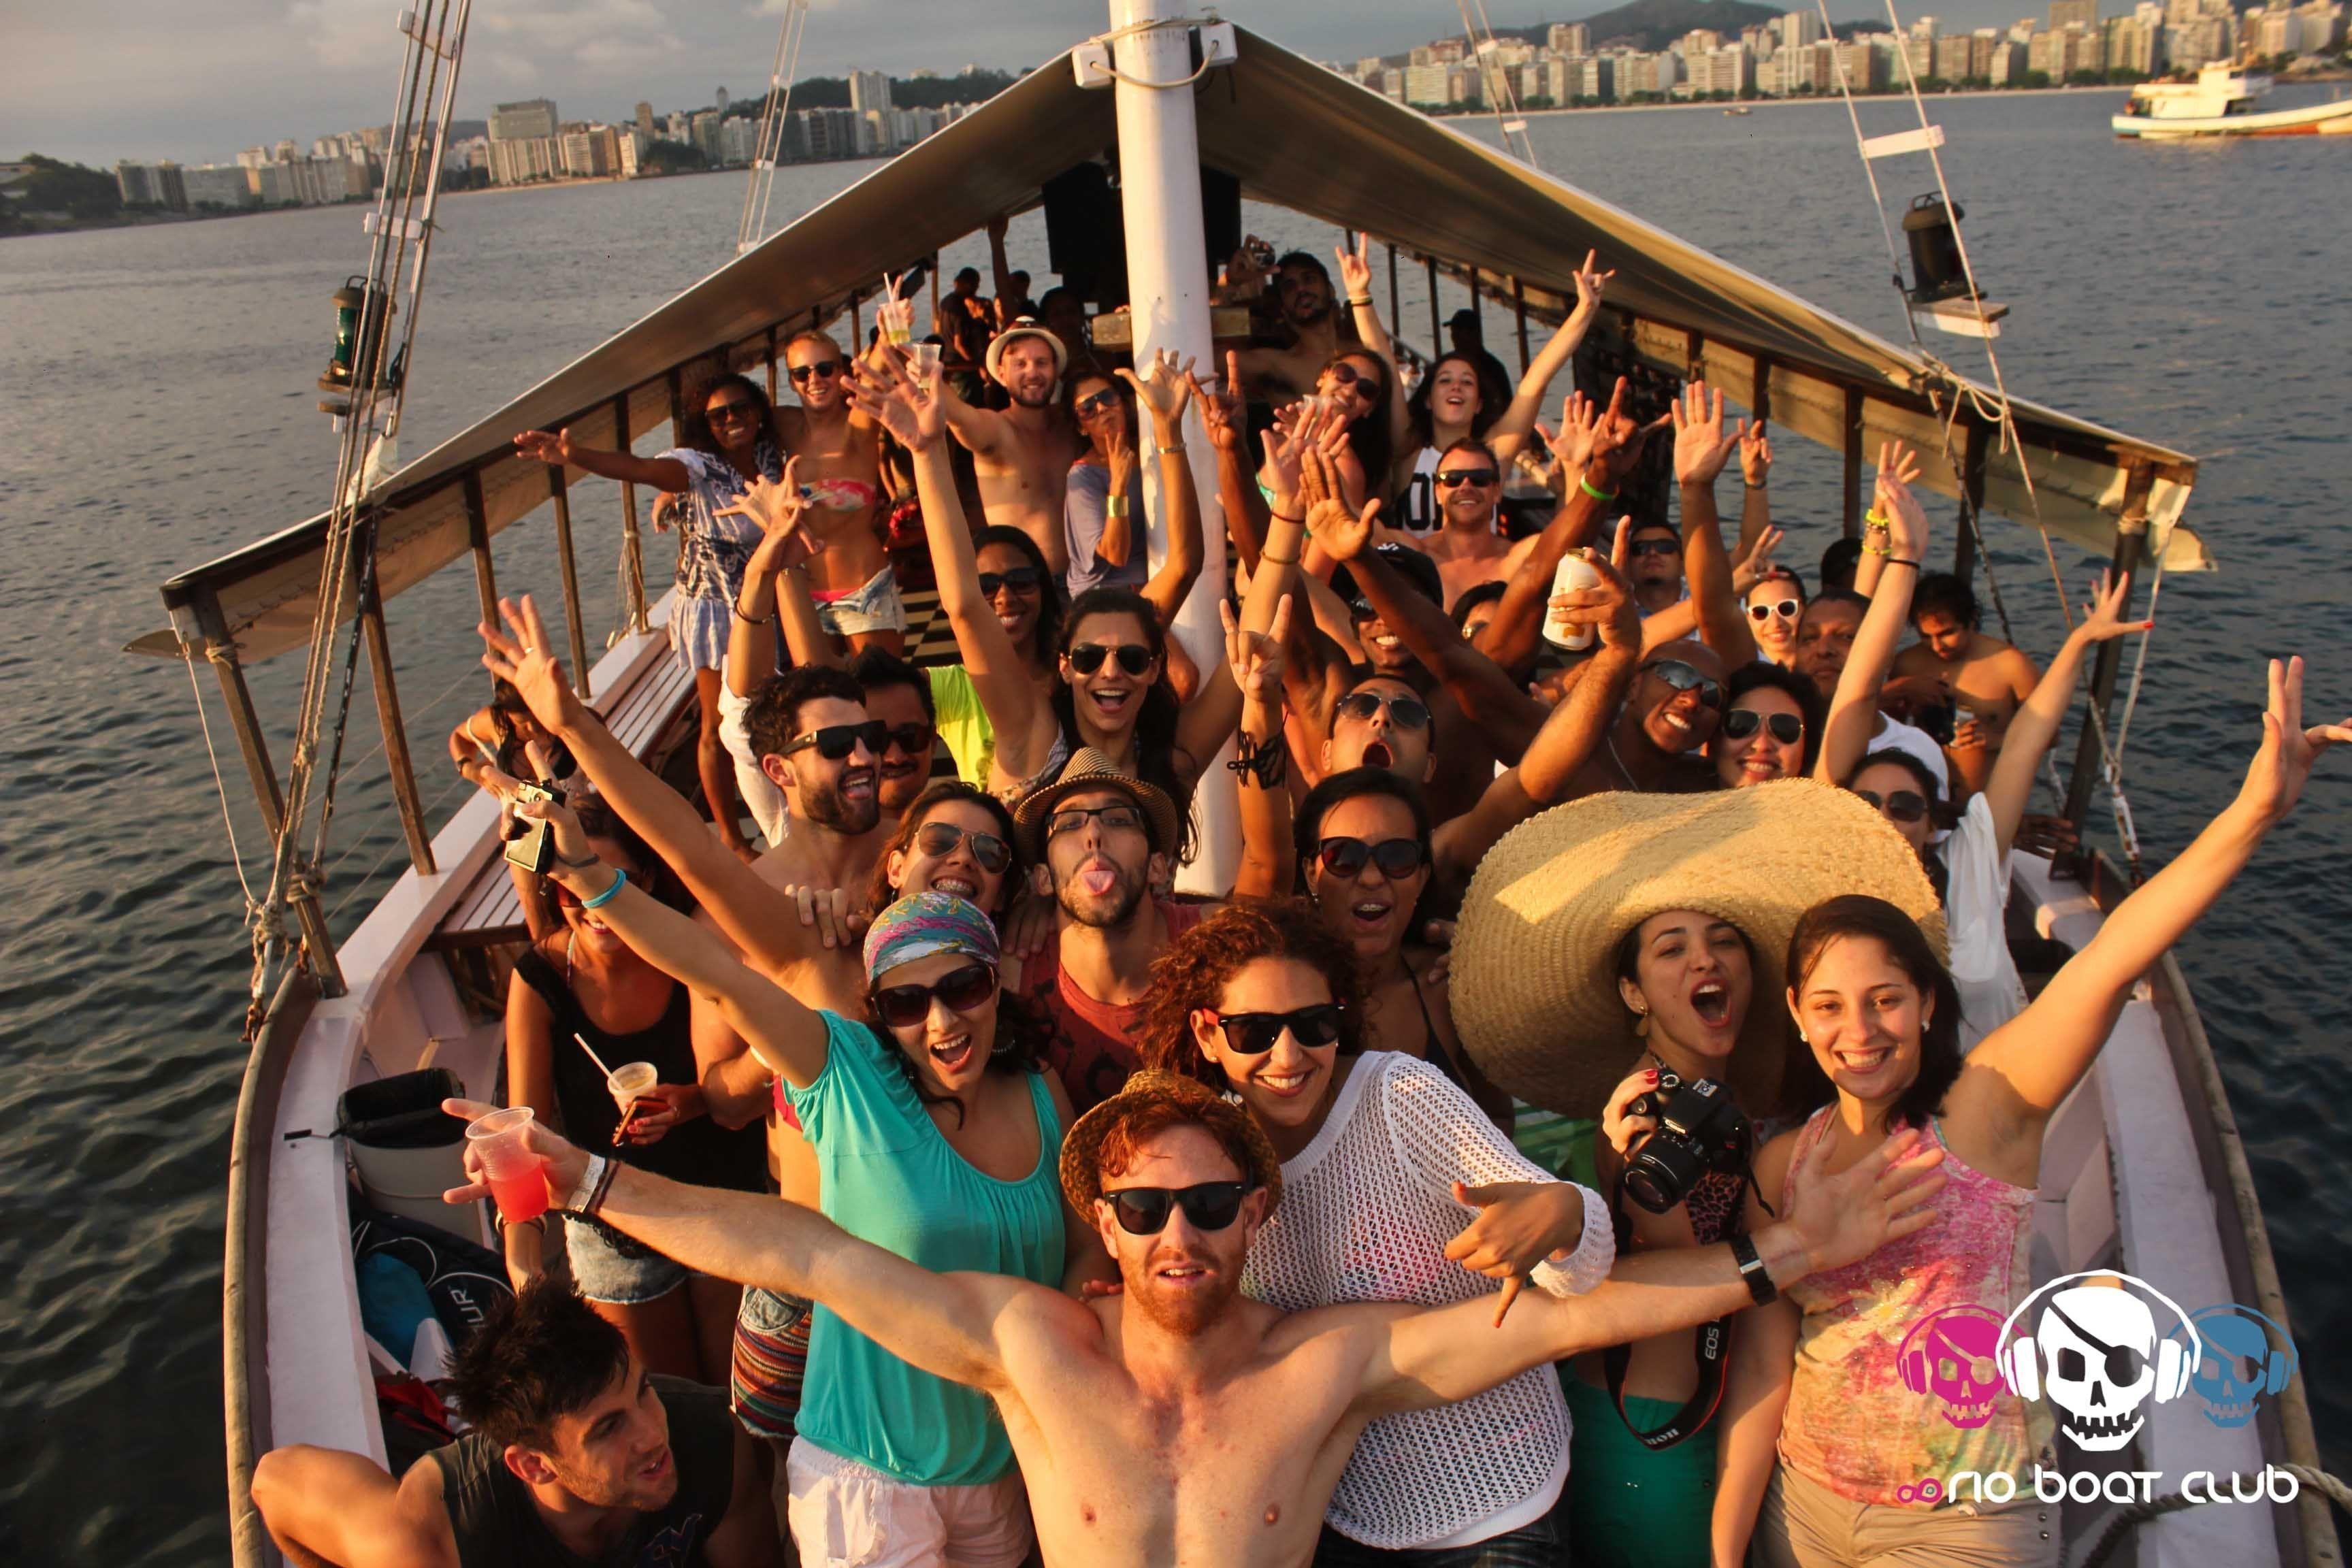 Sunset Boat Club